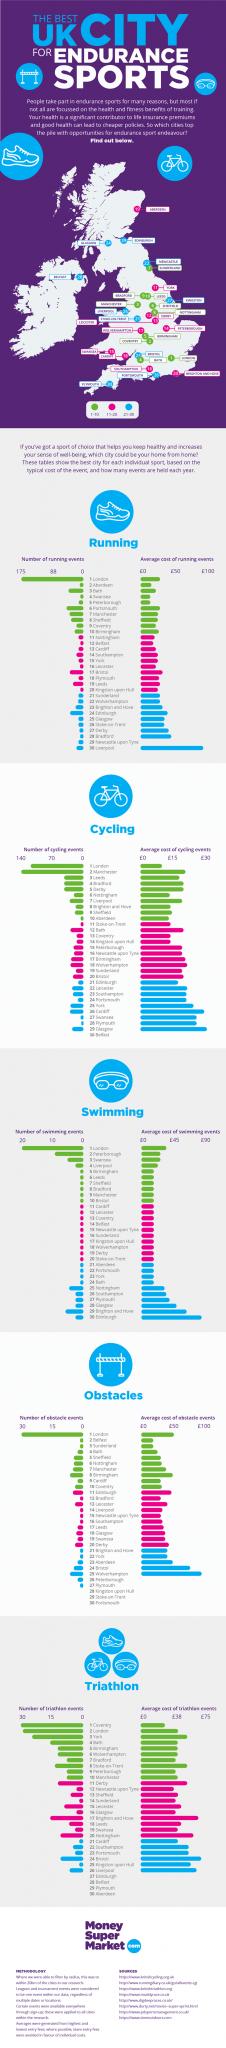 MoneySuperMarket - sporty cities infographic